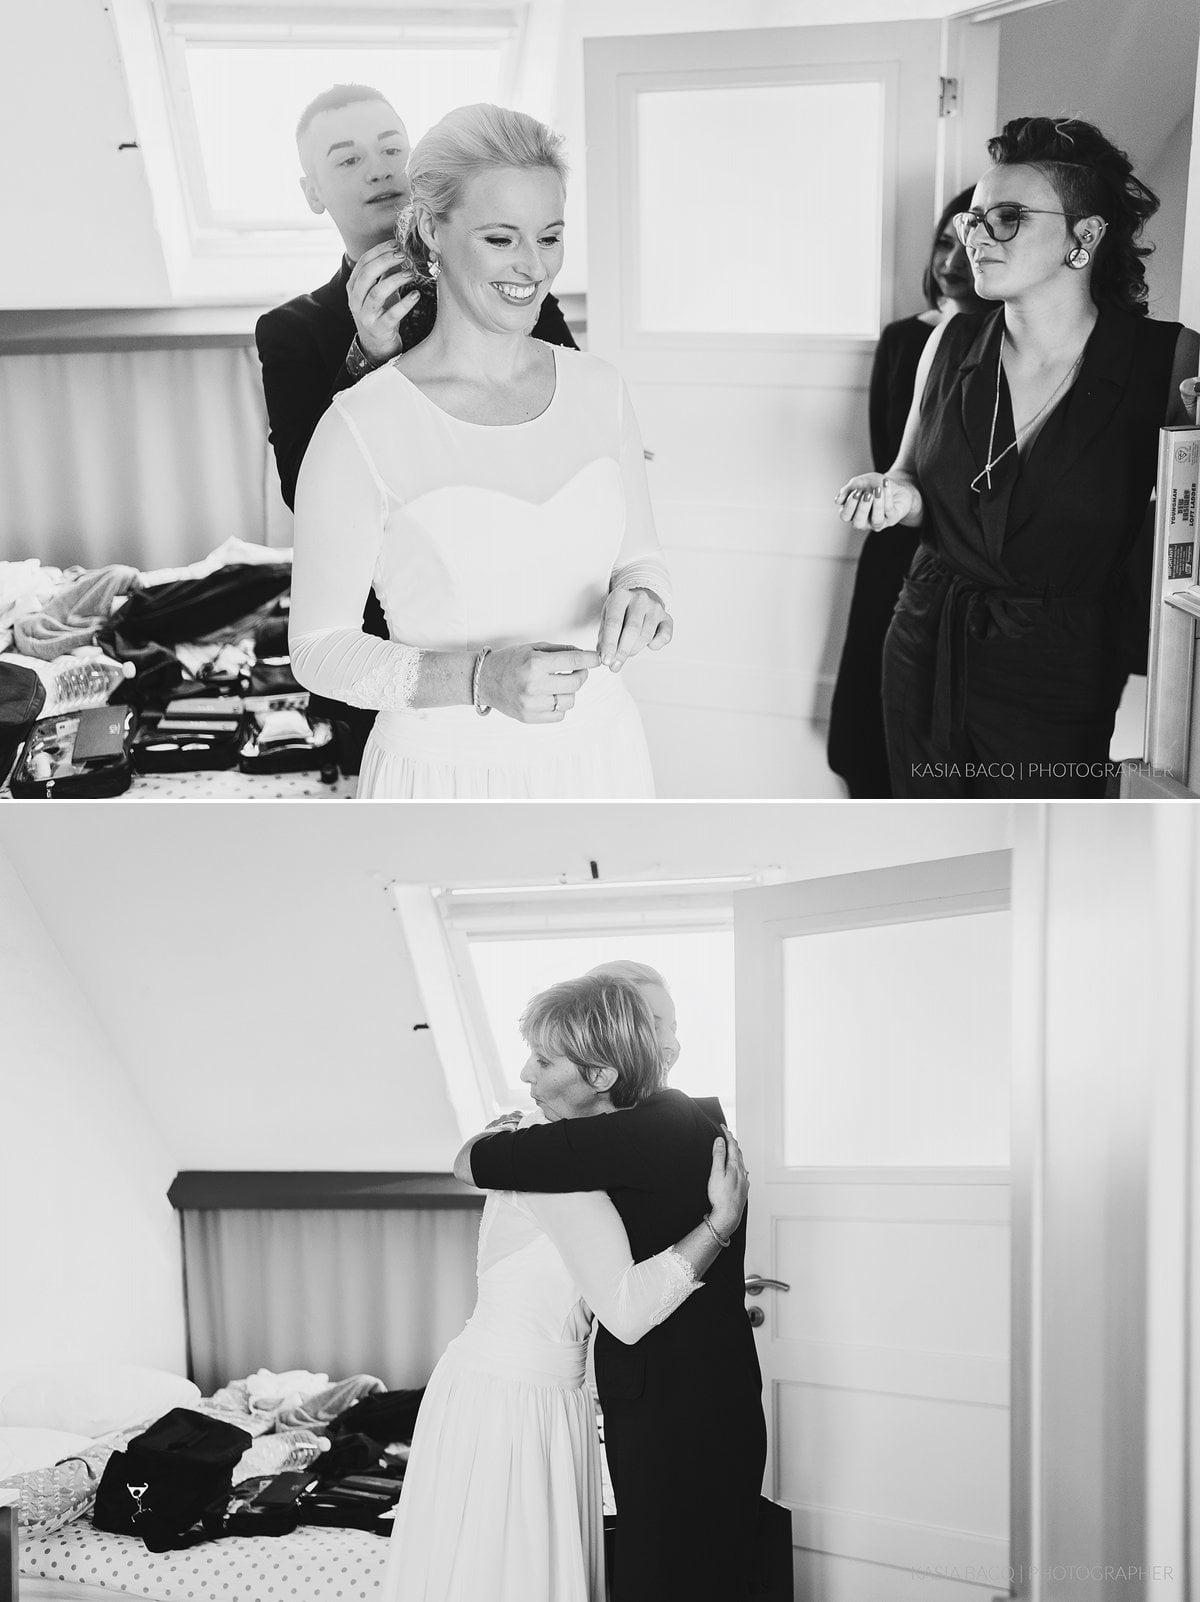 Scandinavian Wedding in Brugge Stan & Britt Kasia Bacq-11